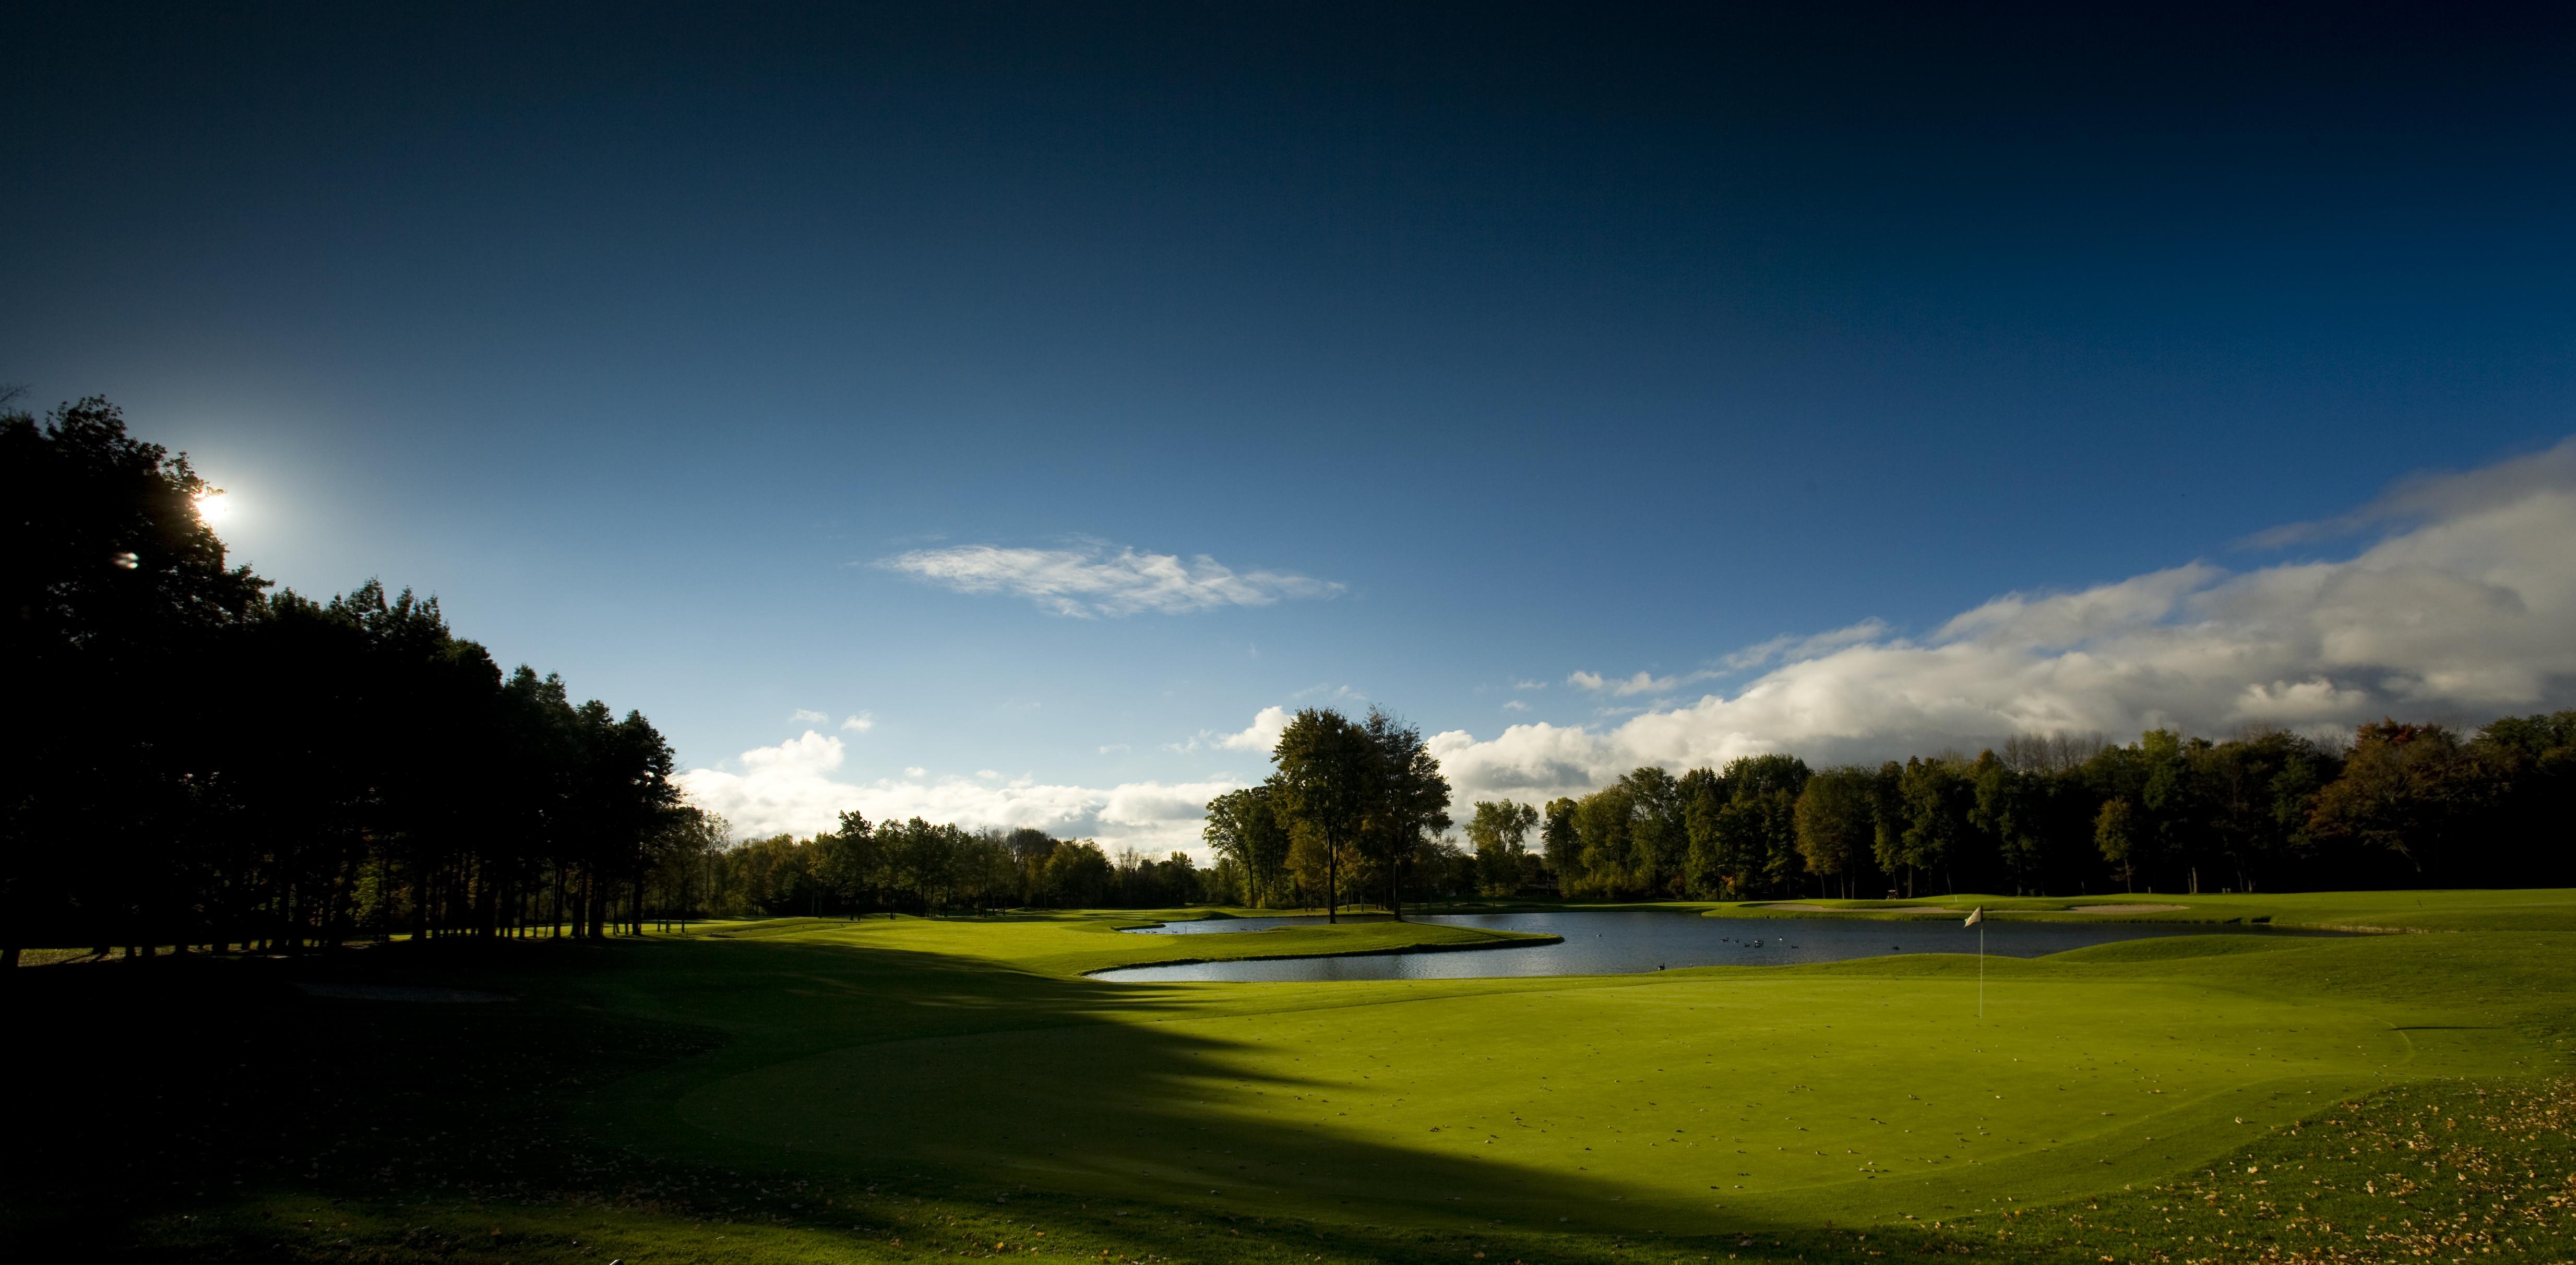 Cherry creek golf club for Cherrycreek